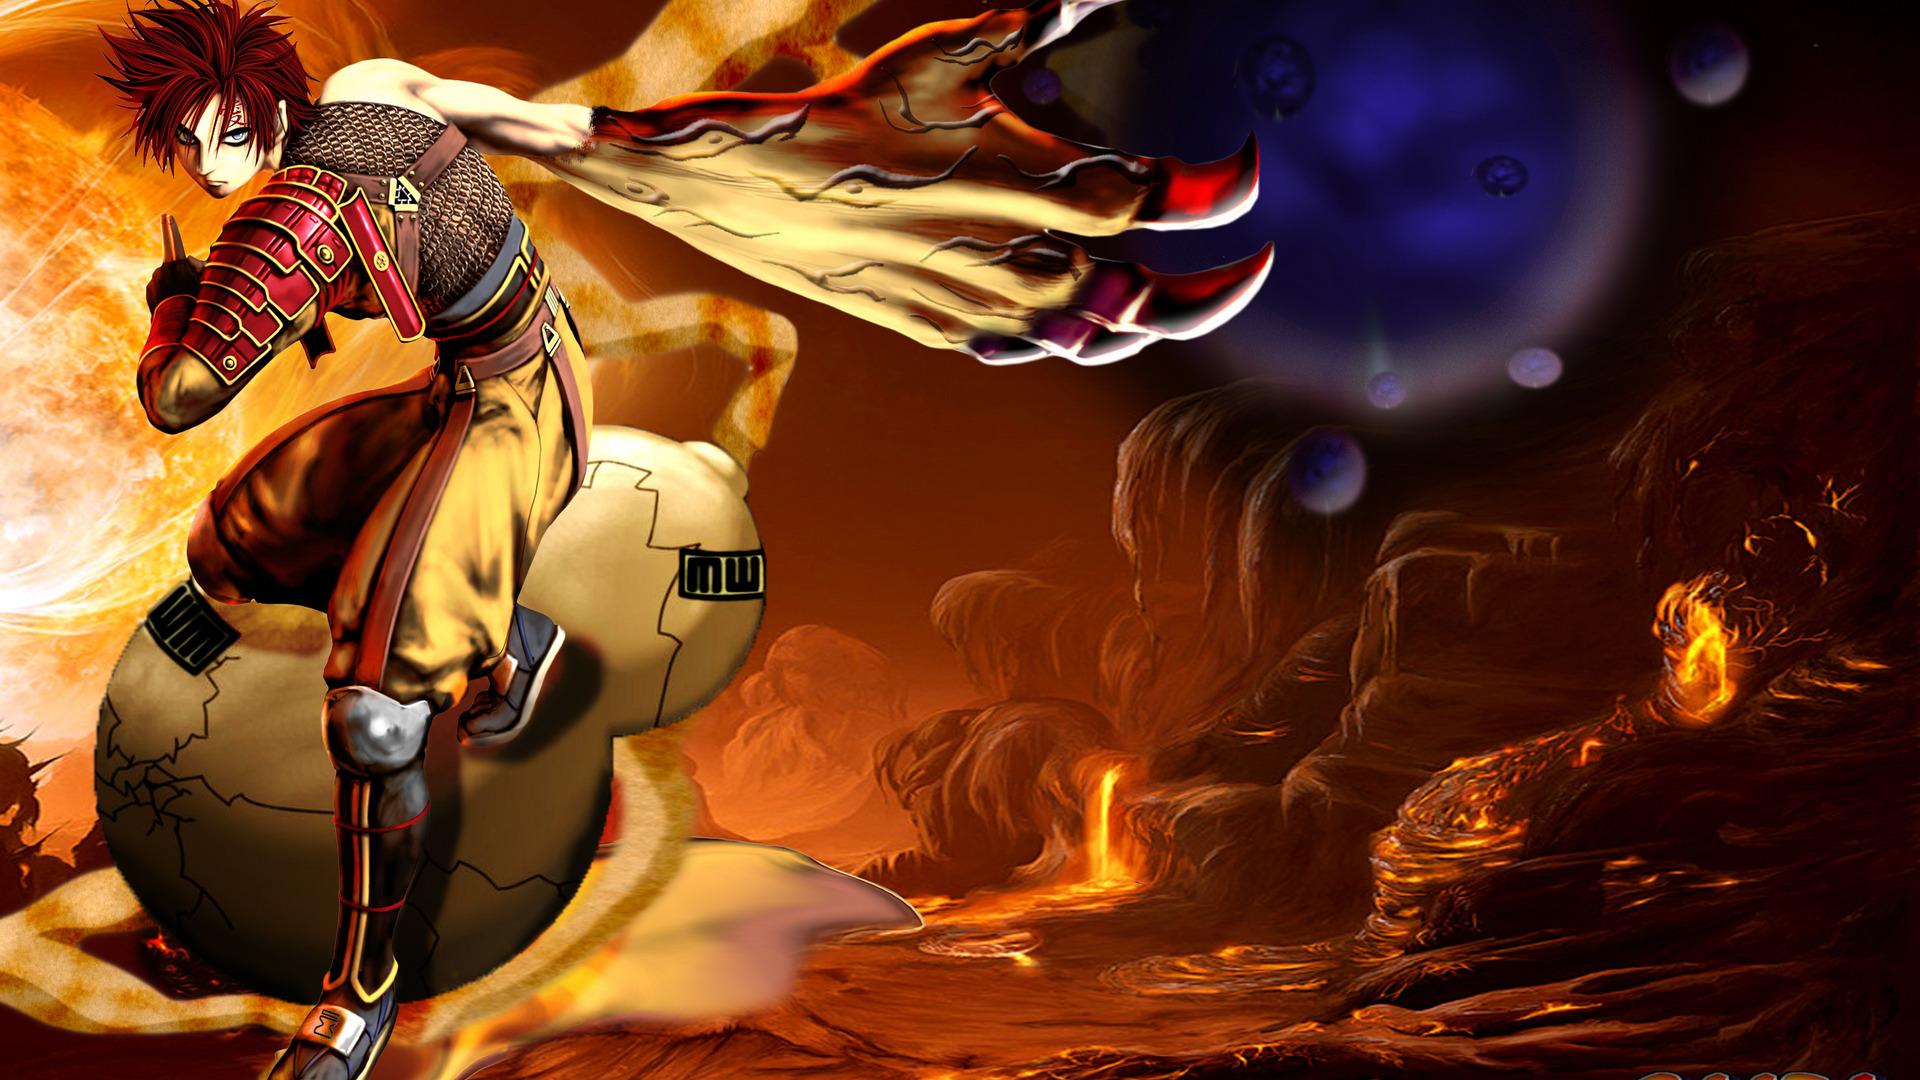 Gaara-Naruto-HD-Backgrounds-Abyss-wallpaper-wp3601482